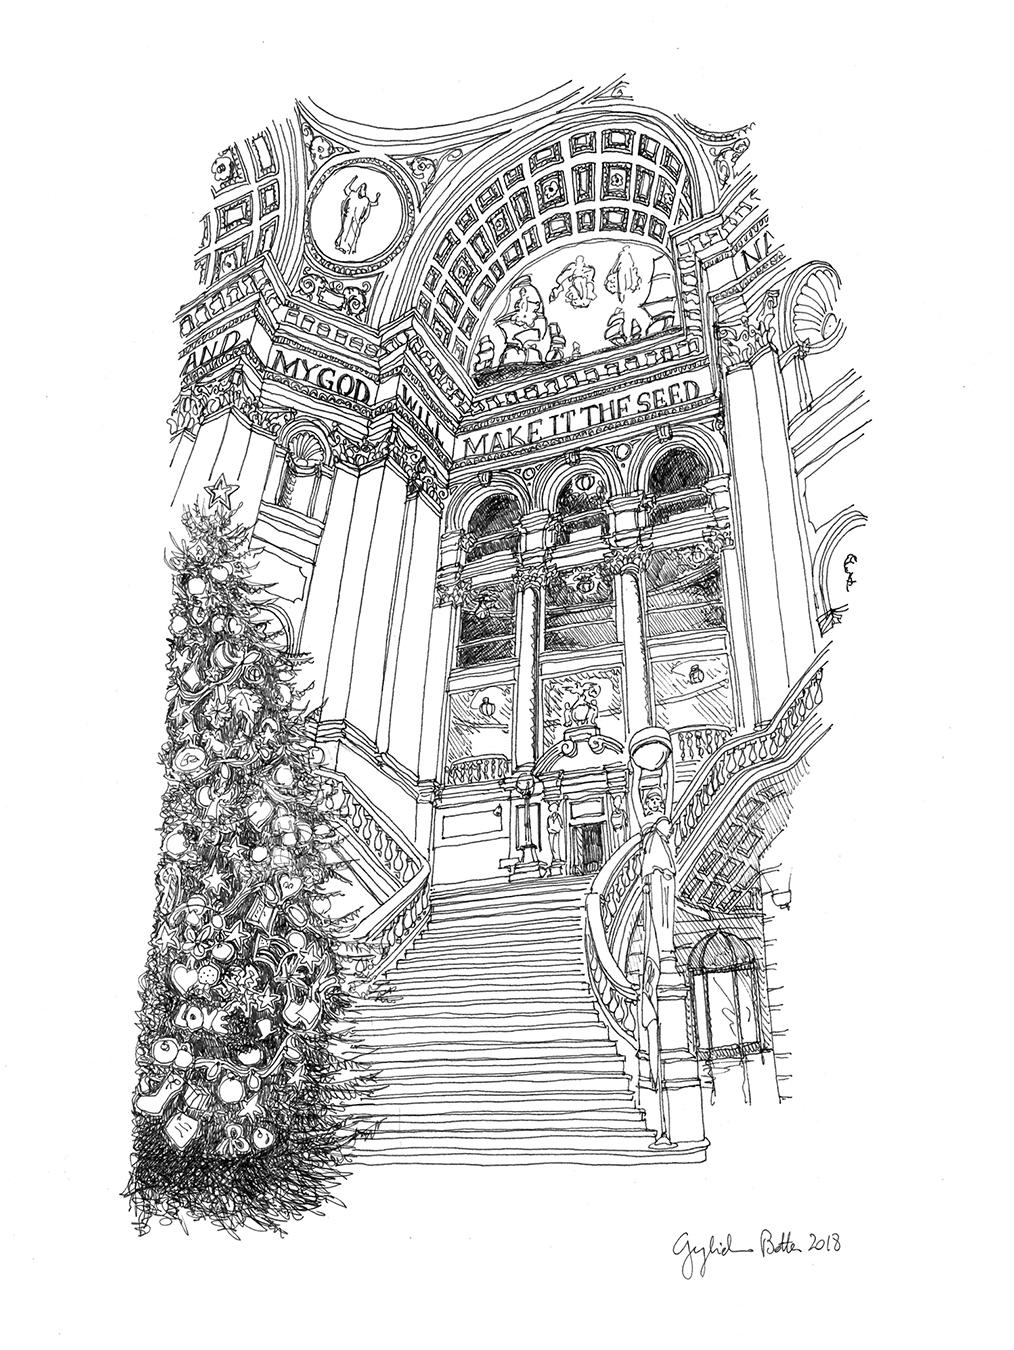 Botter_Guglielmo_Harrisburg_Grand_Staircase_PA_State_Capitol